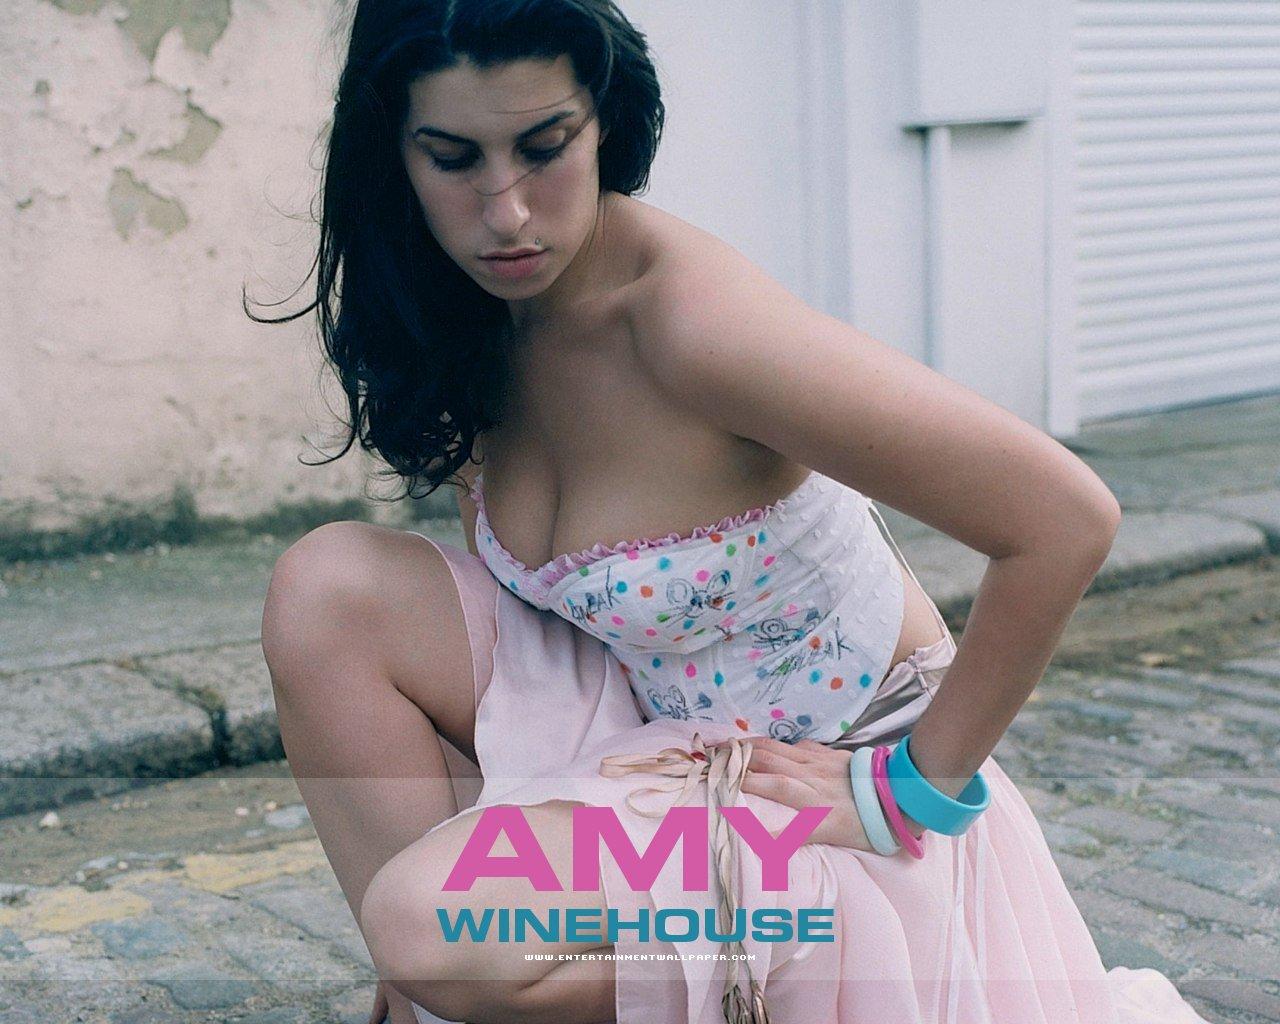 http://1.bp.blogspot.com/_E26Ndy_oKVc/TSdWcY5qyTI/AAAAAAAAA64/5an0puSHi1Y/s1600/amy_winehouse05.jpg